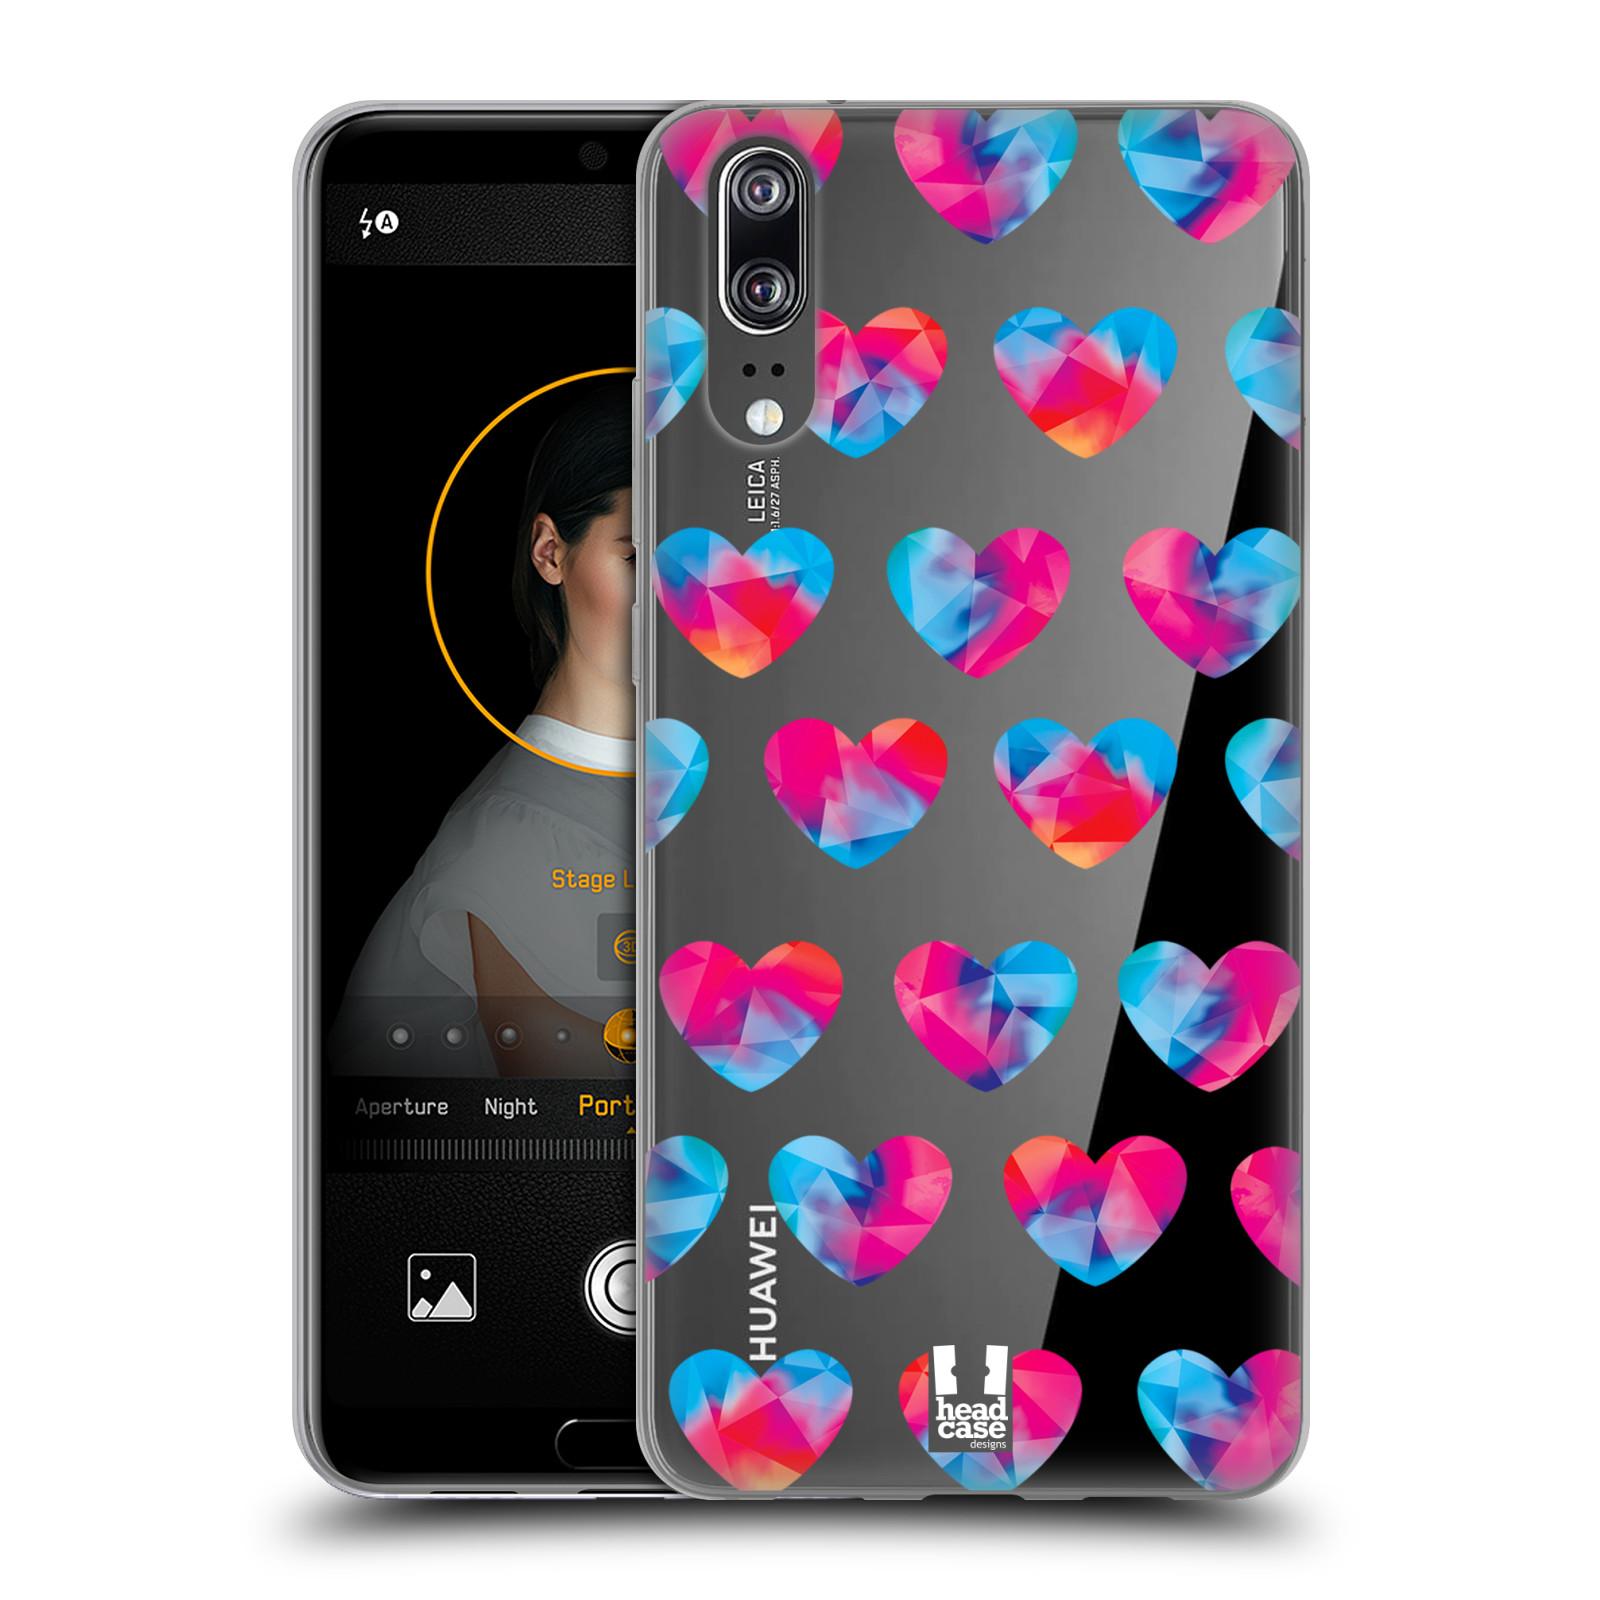 Silikonové pouzdro na mobil Huawei P20 - Head Case - Srdíčka hrající barvami